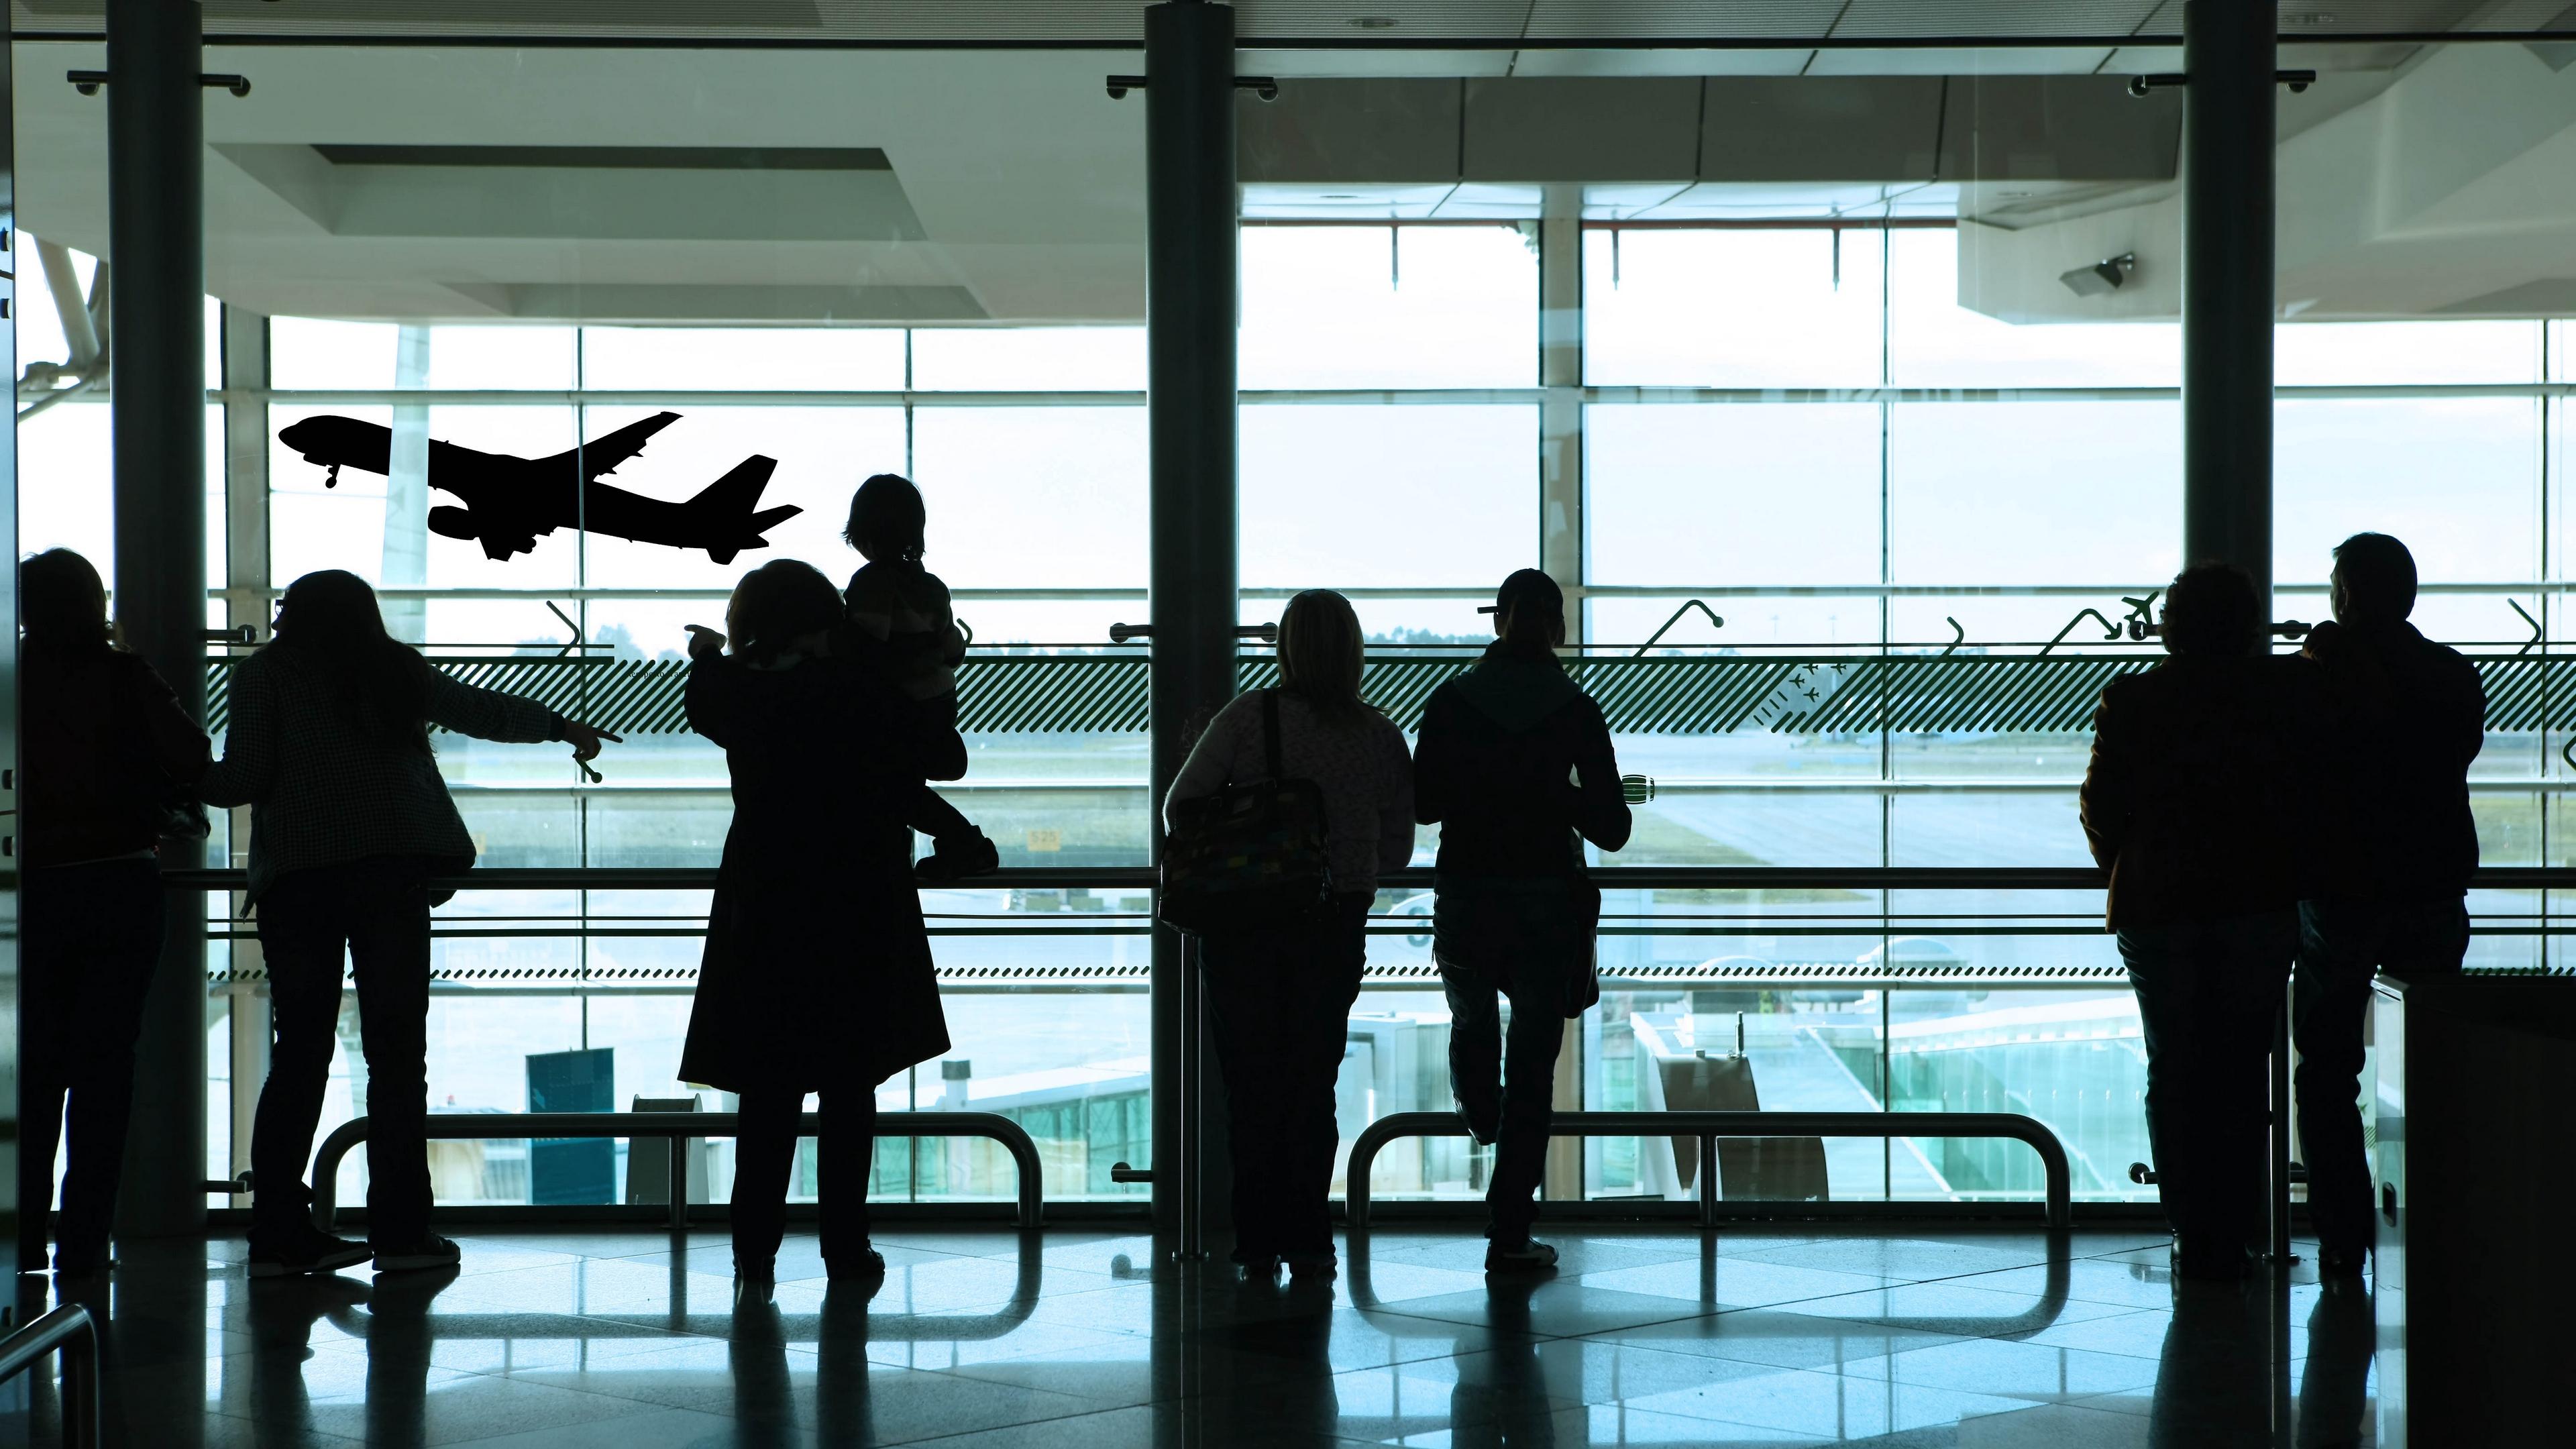 people airport shadow 4k 1540574434 - people, airport, shadow 4k - Shadow, People, airport